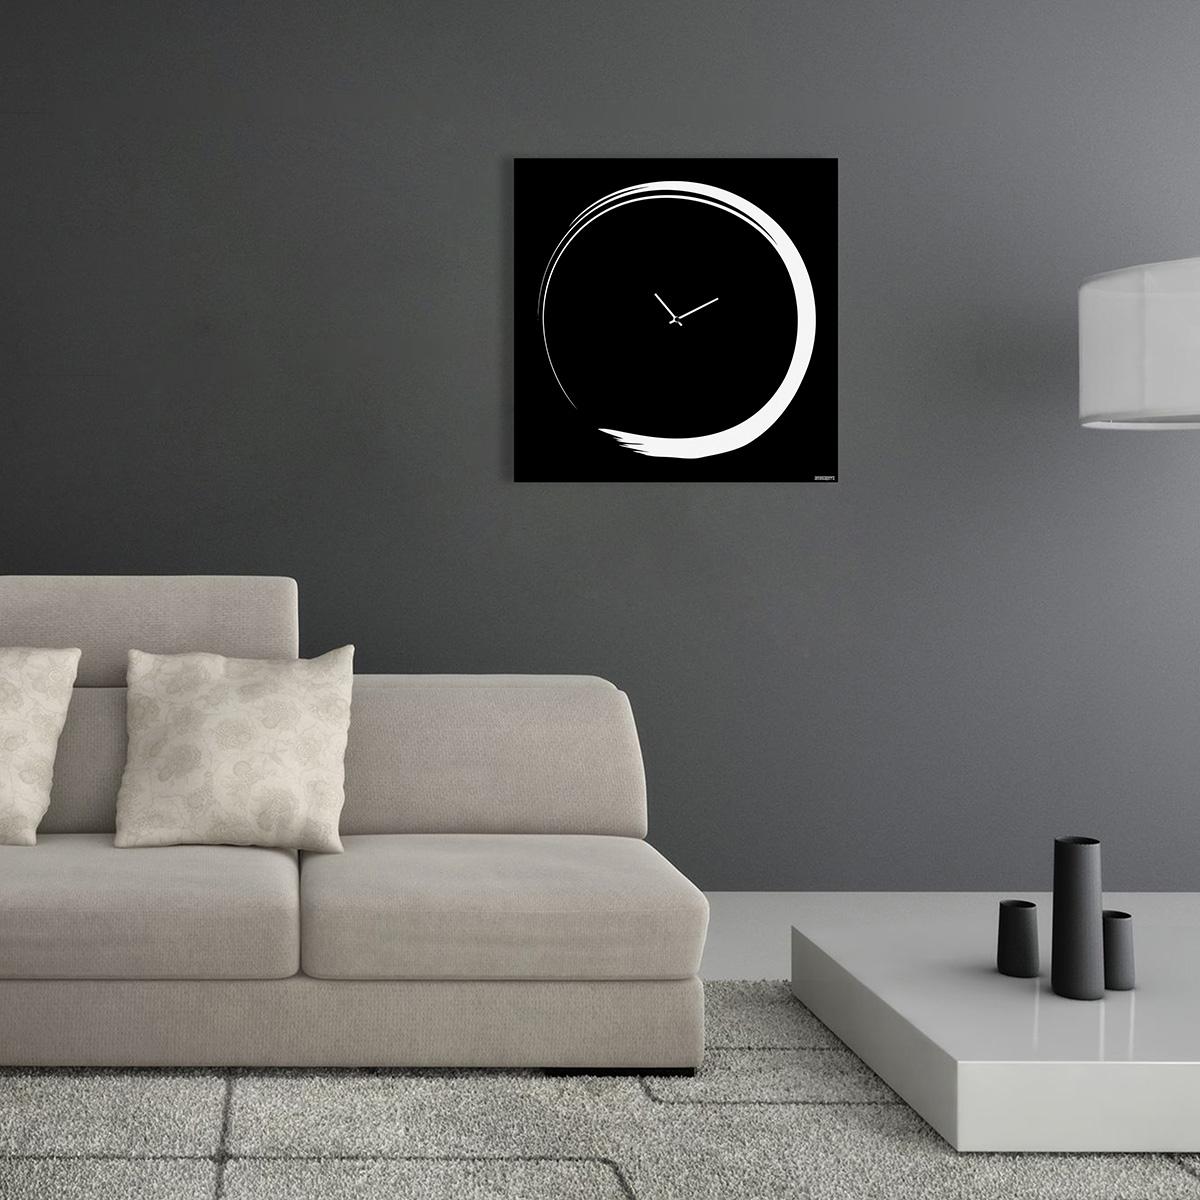 S Enso Modern Big Wall Clock Italian Design Designobject